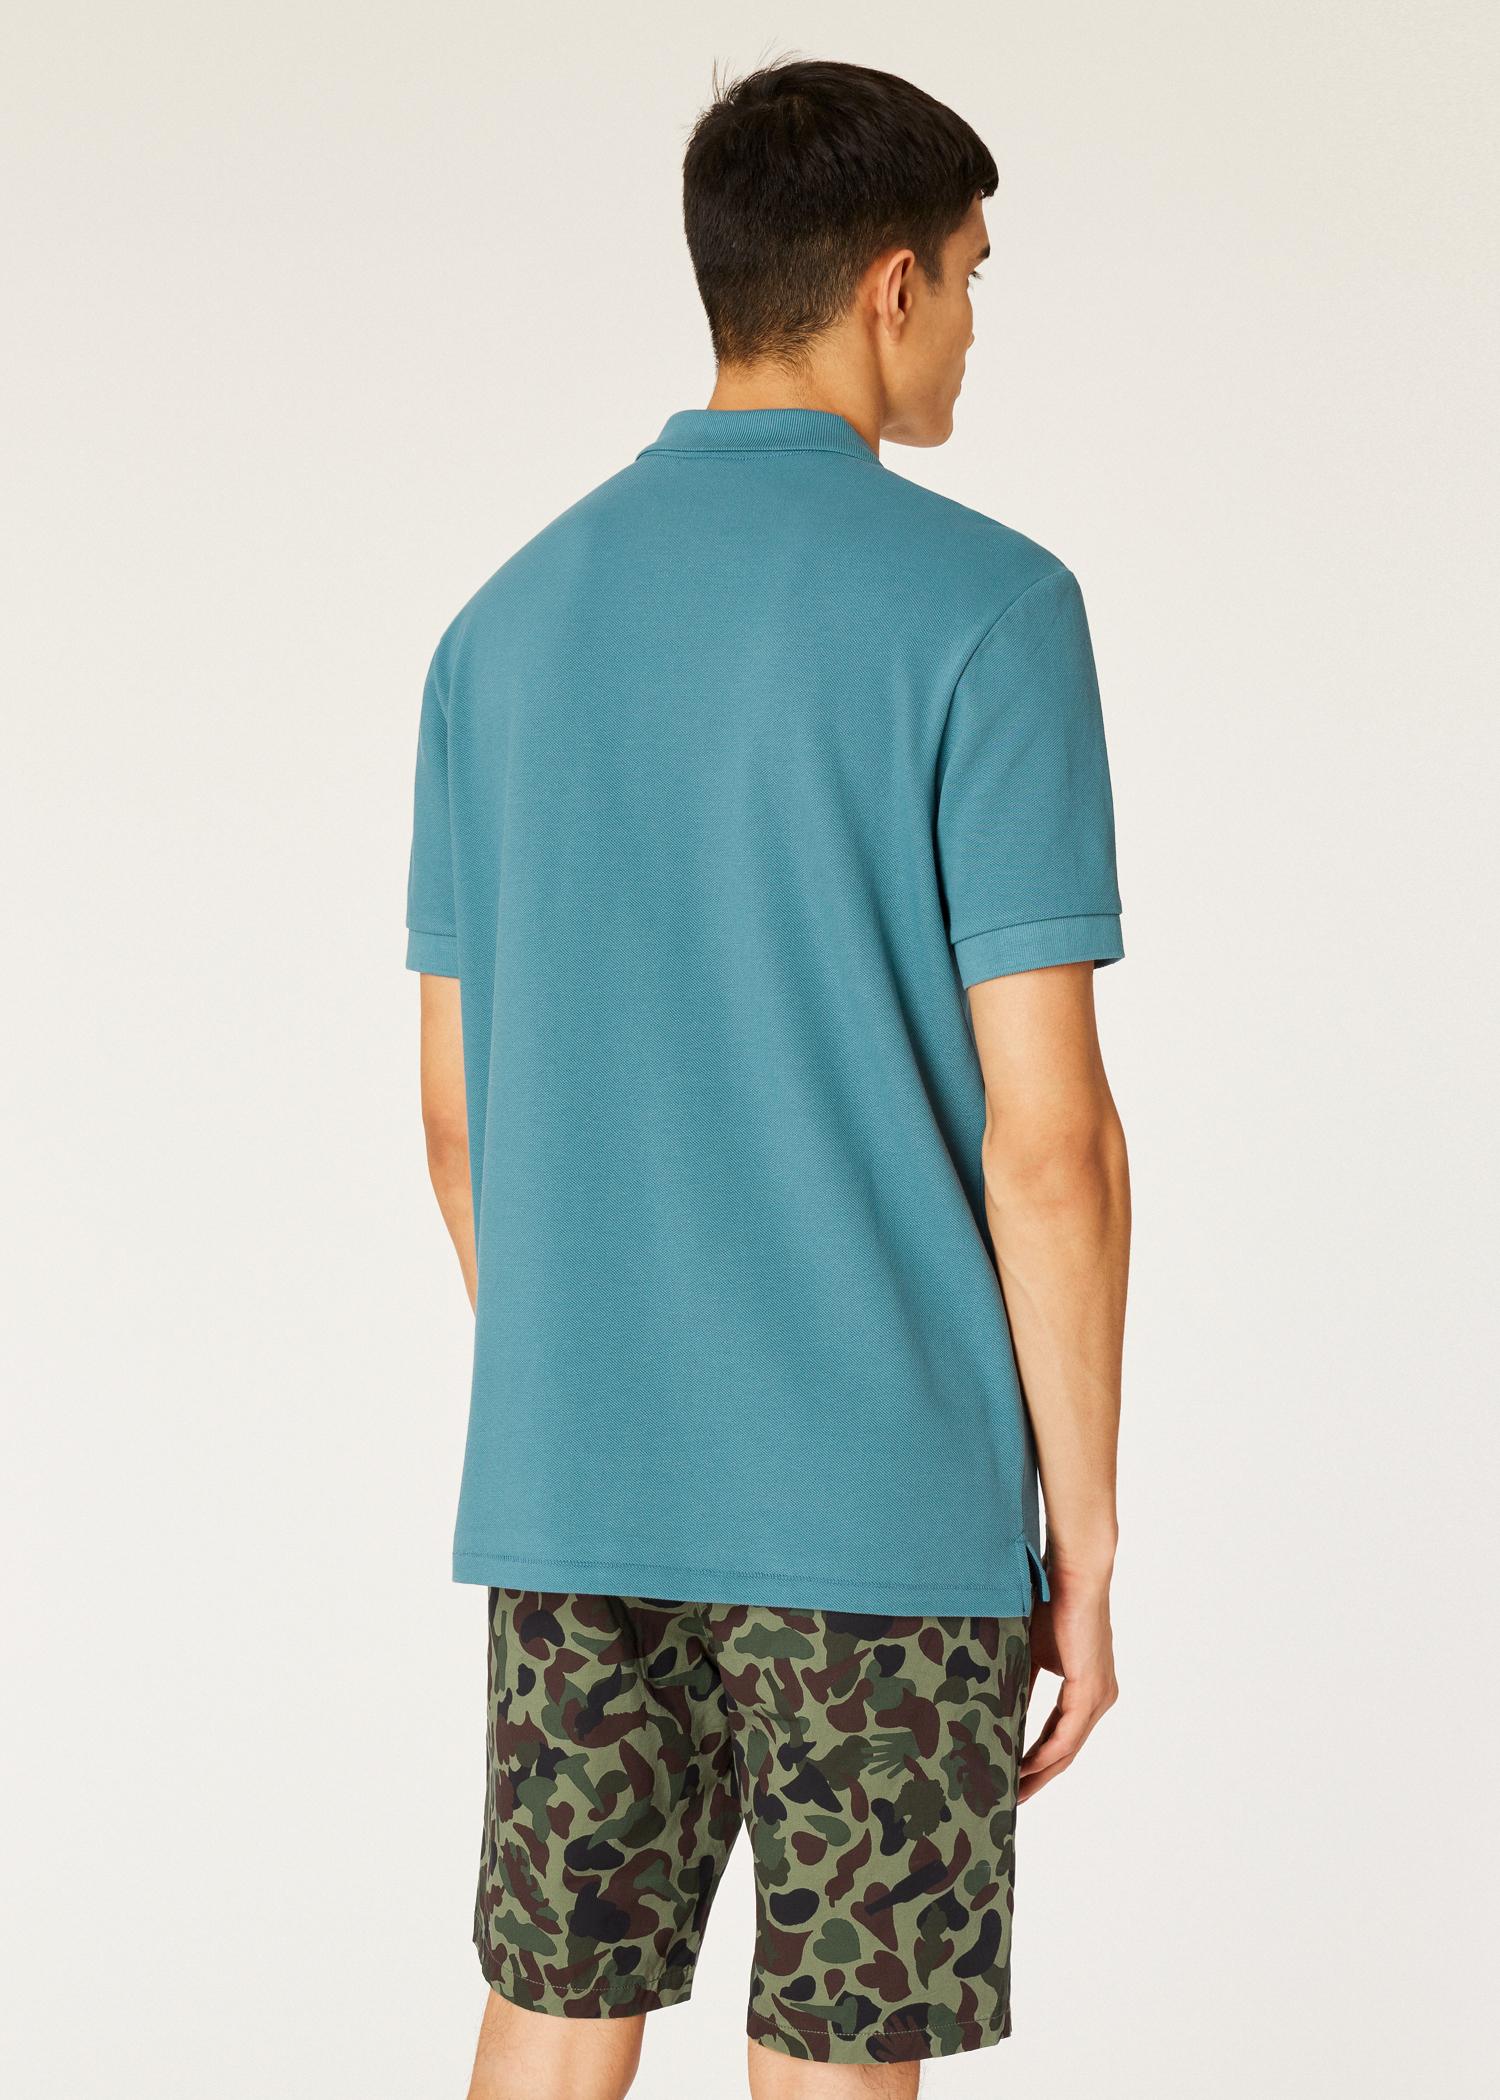 1d7d94b6 Model back close up - Men's Teal Organic Cotton-Piqué Zebra Logo Polo Shirt  Paul